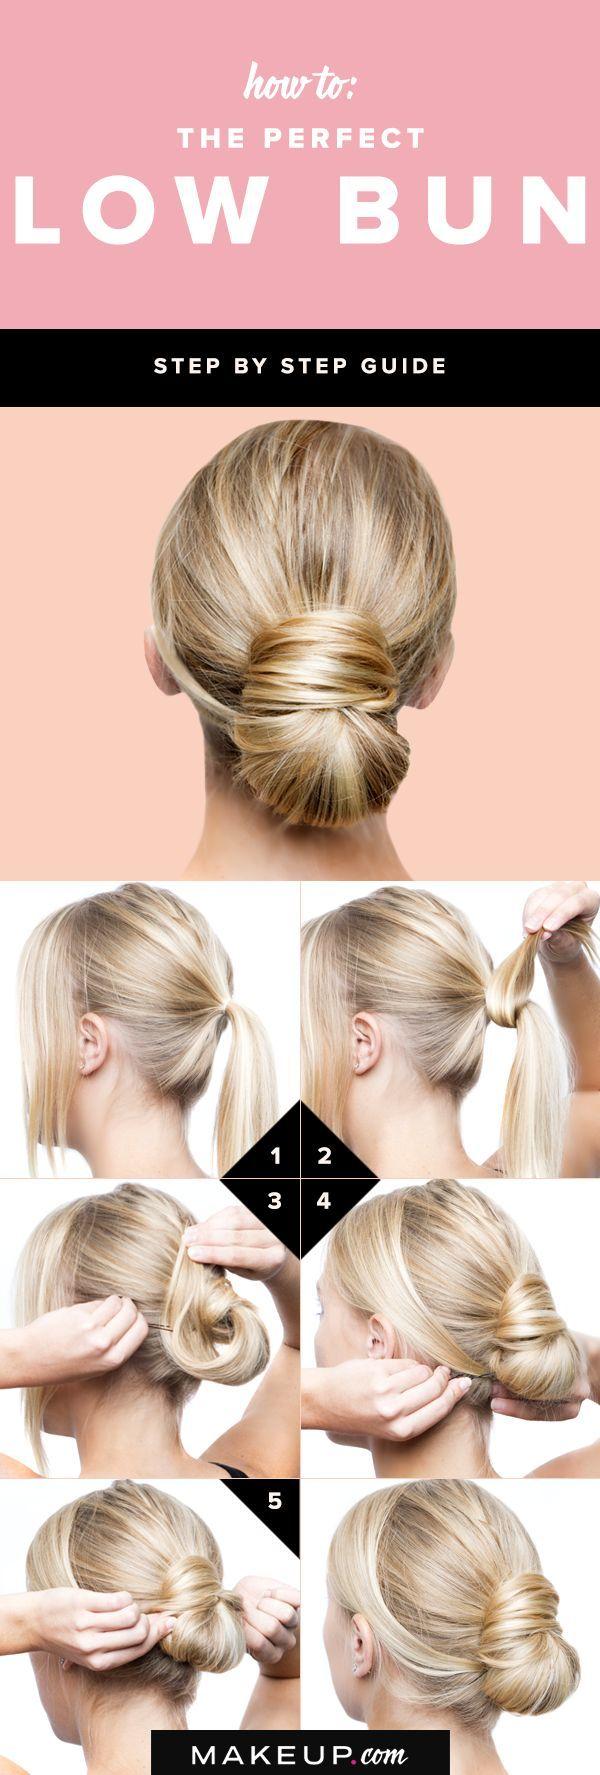 4 Steps To Create The Perfect Low Bun Hair Tutorials Ideas